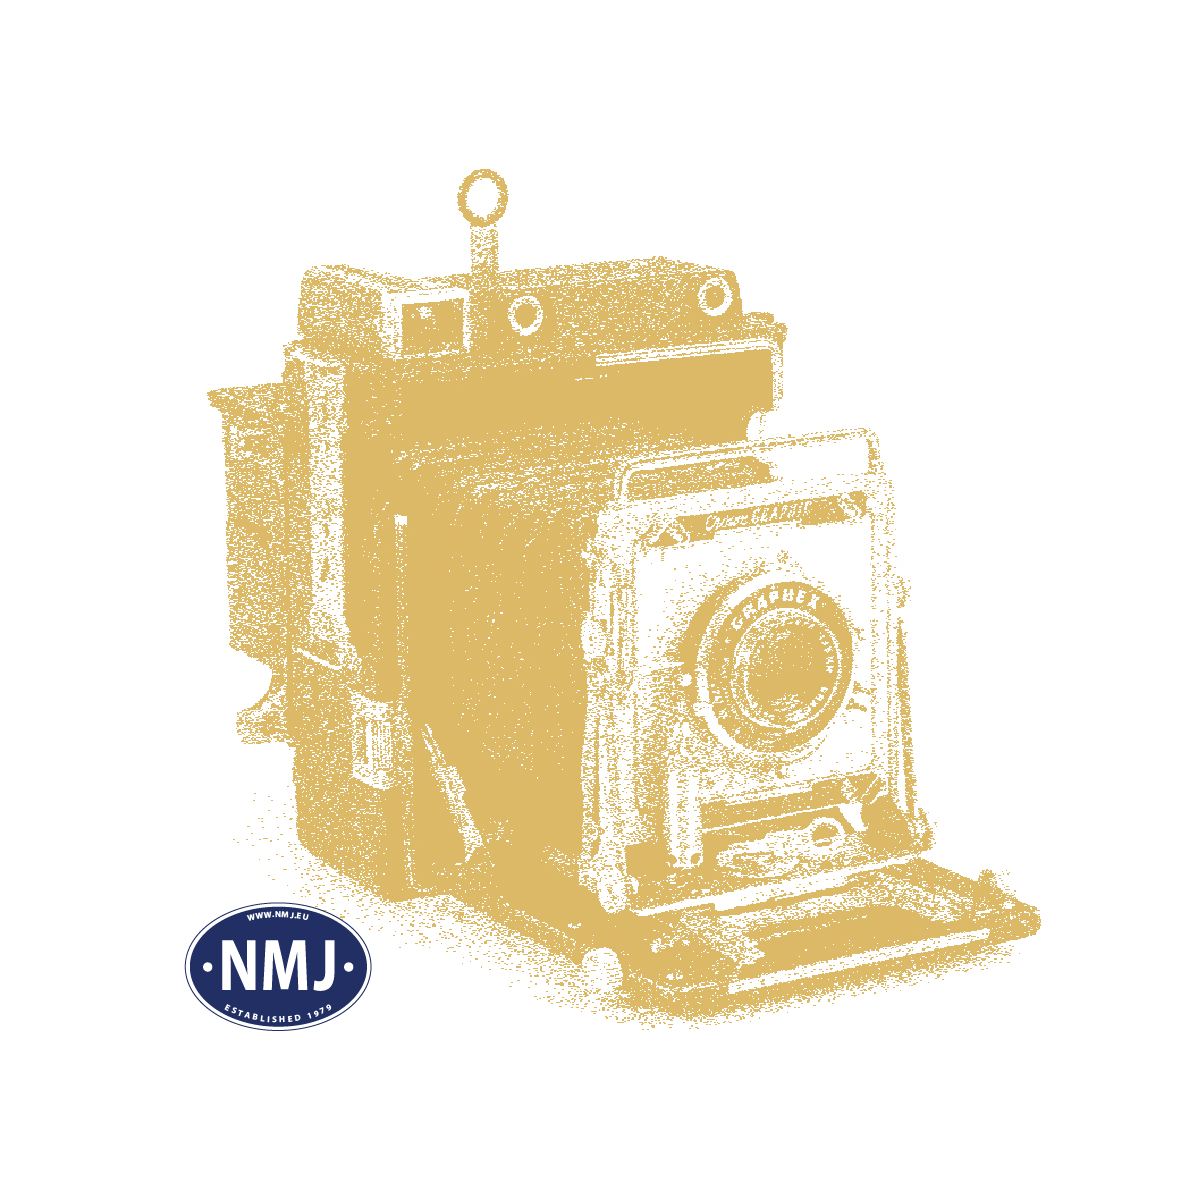 NOC15570 - Vanner Blomster